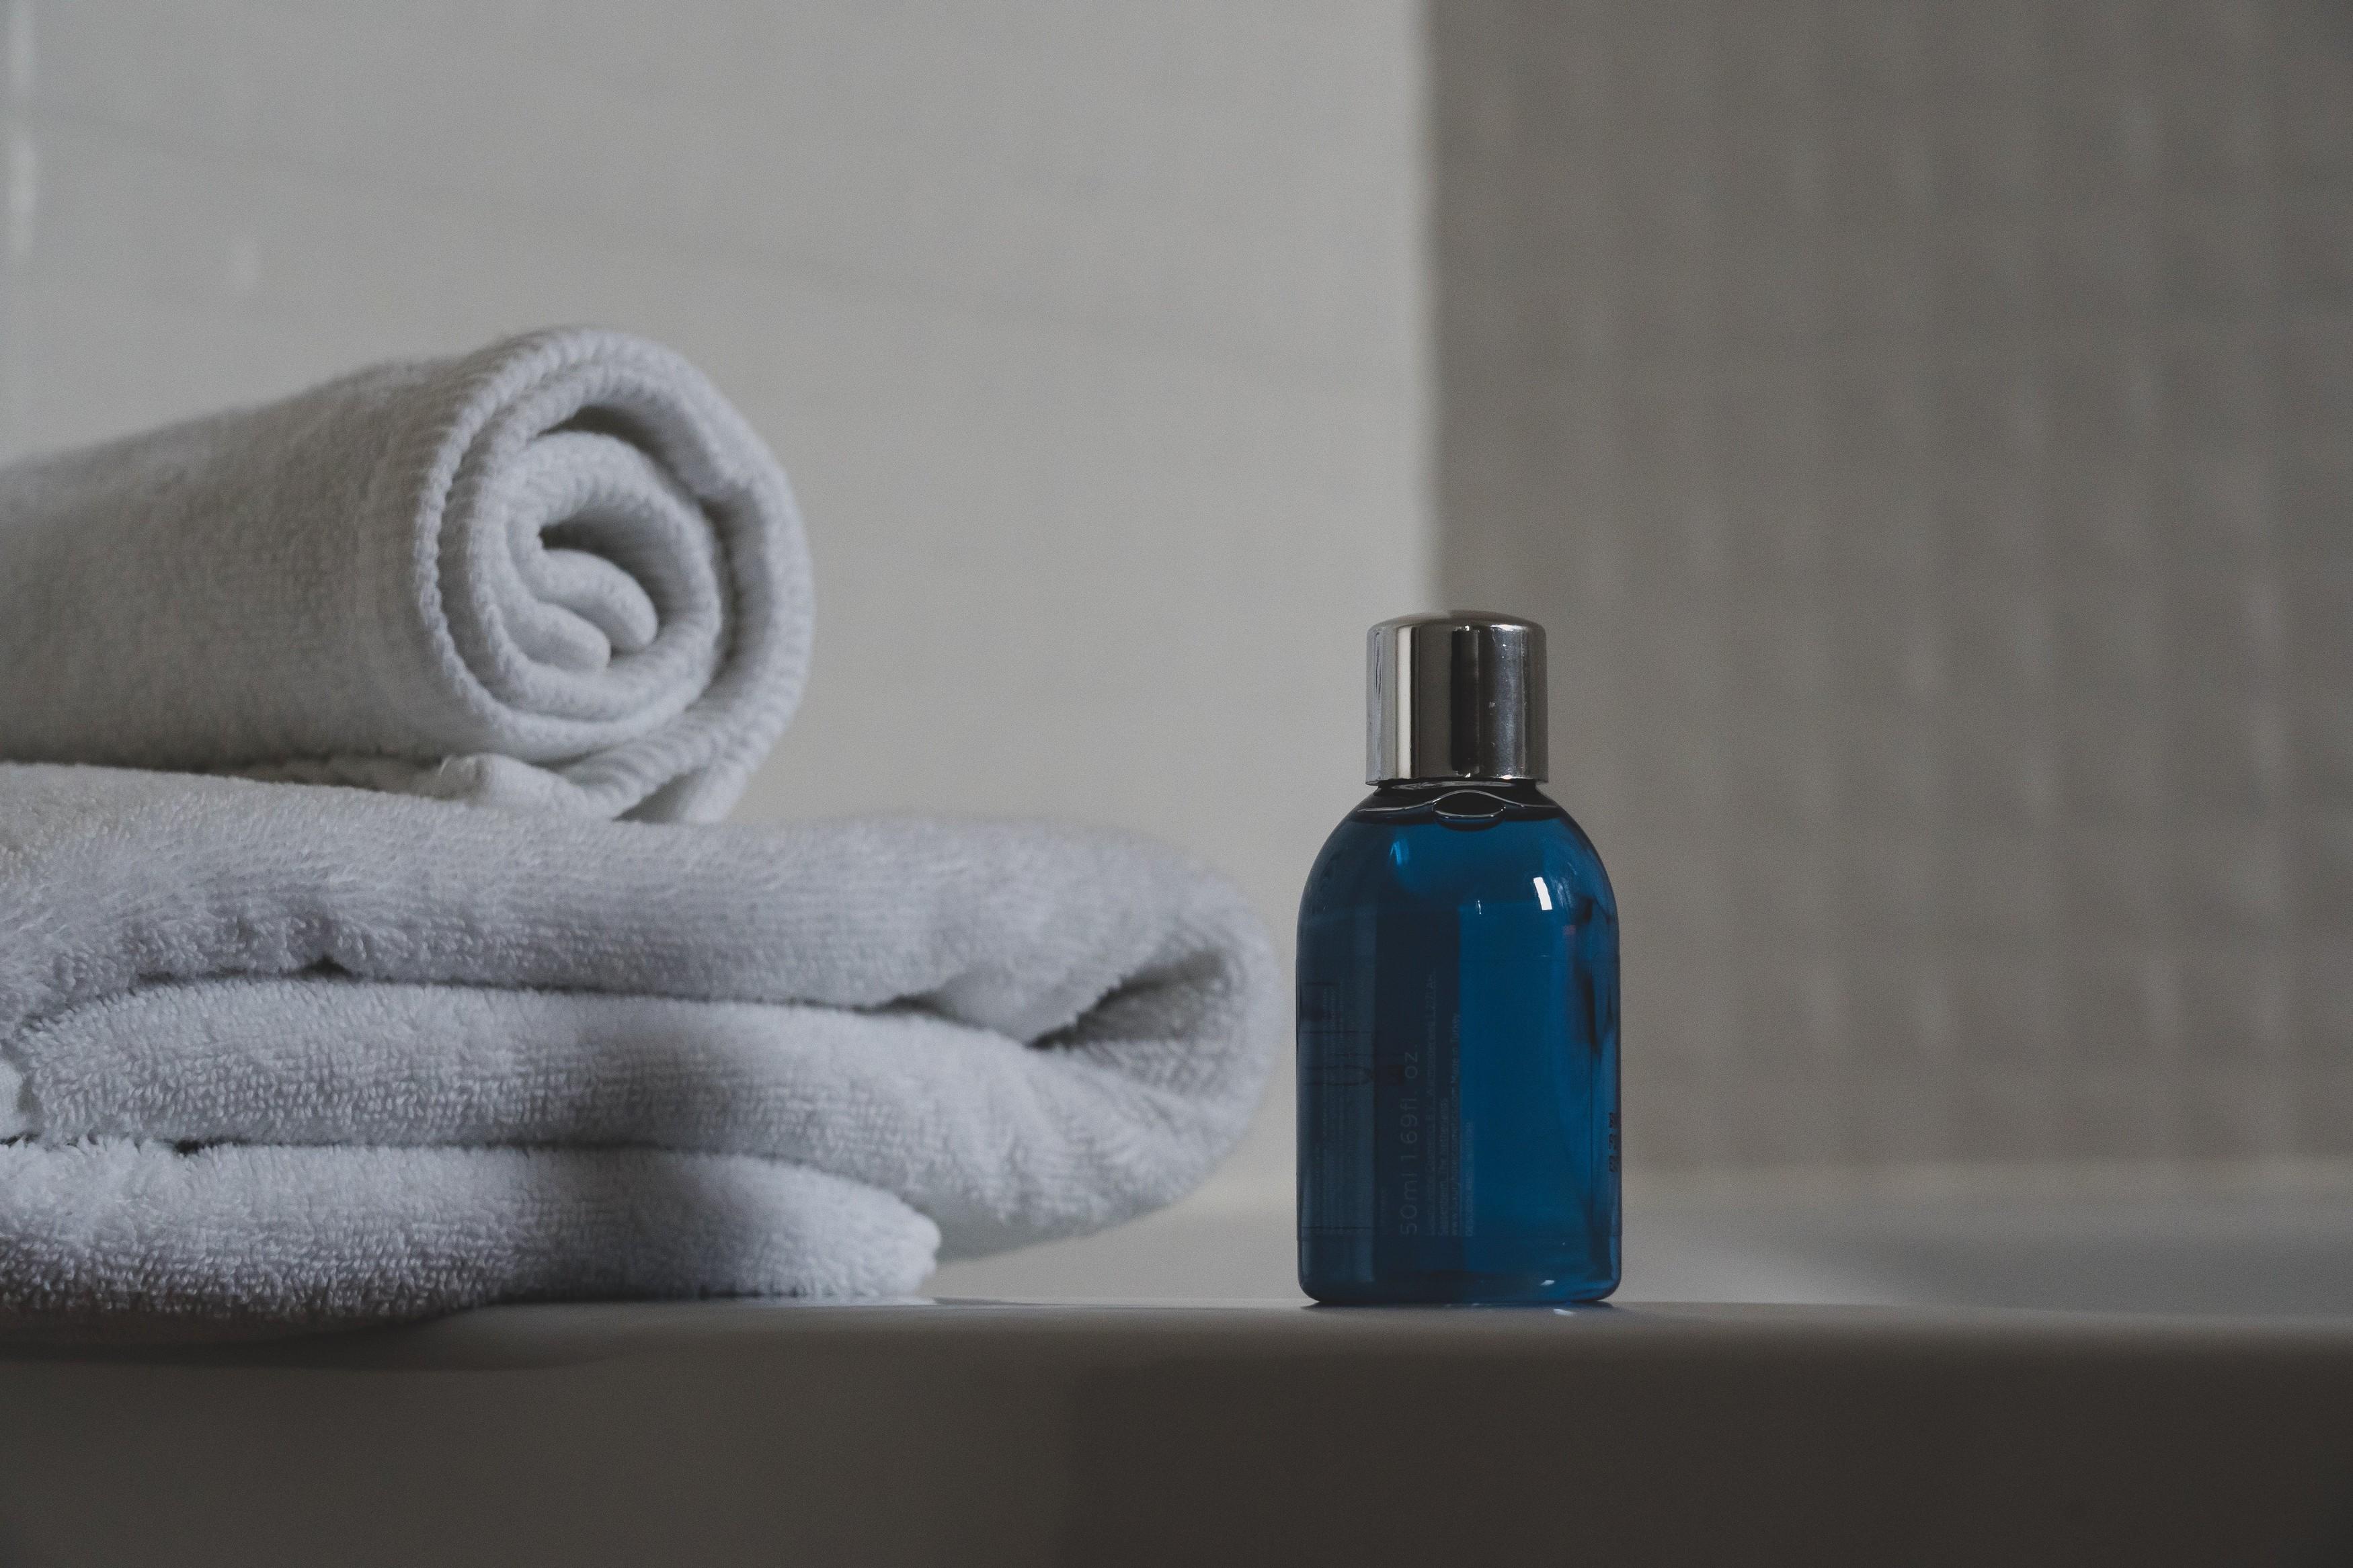 blue glass bottle of body wash beside a white towel.